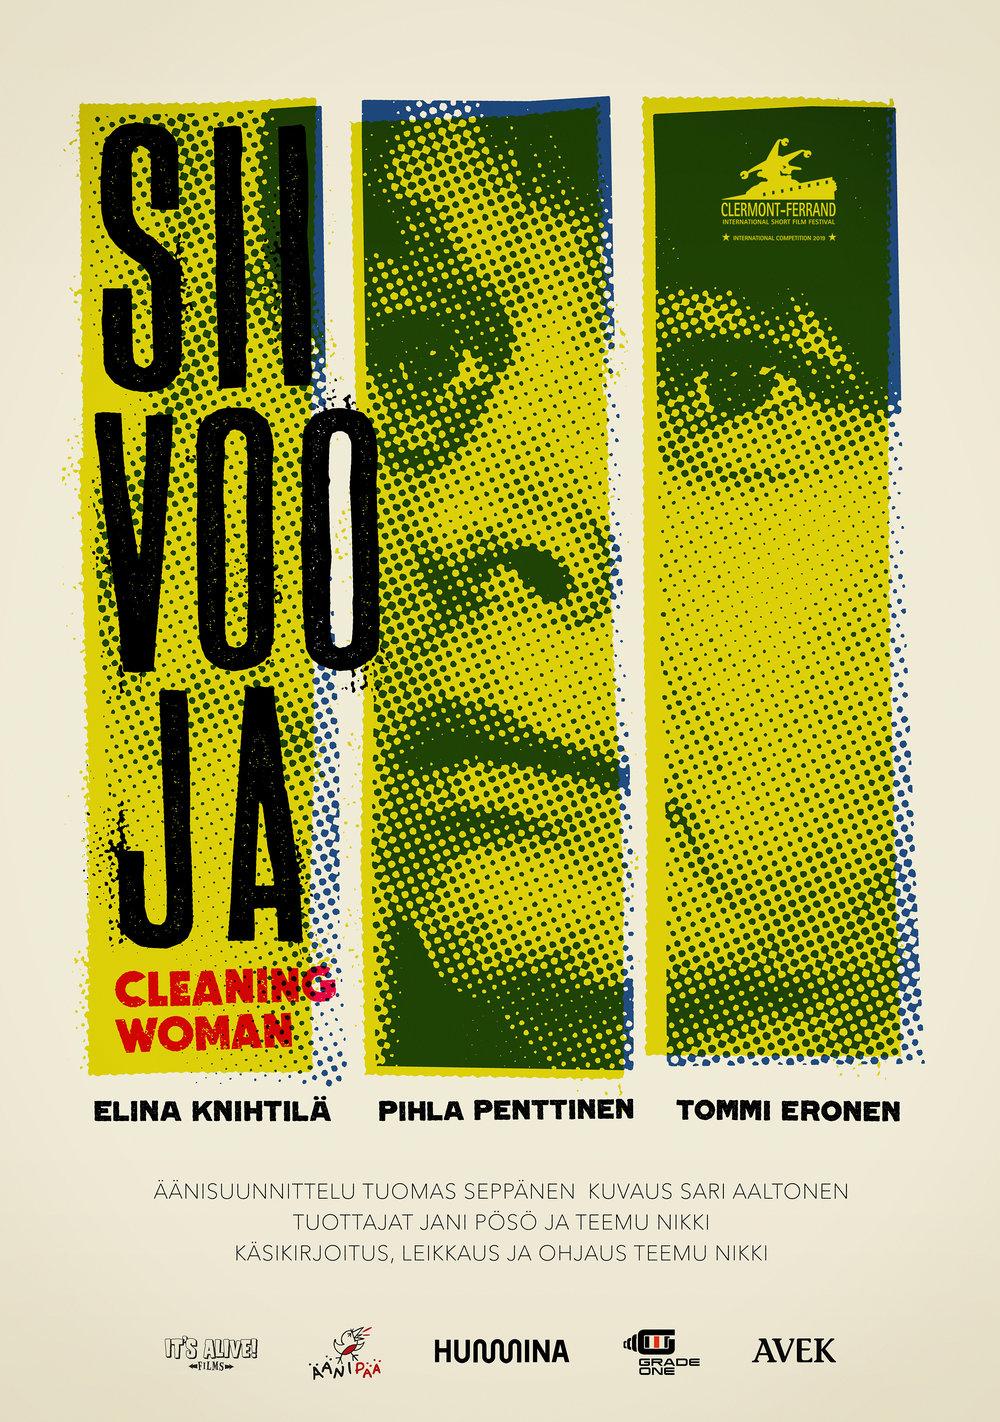 siivooja-poster-small.jpg